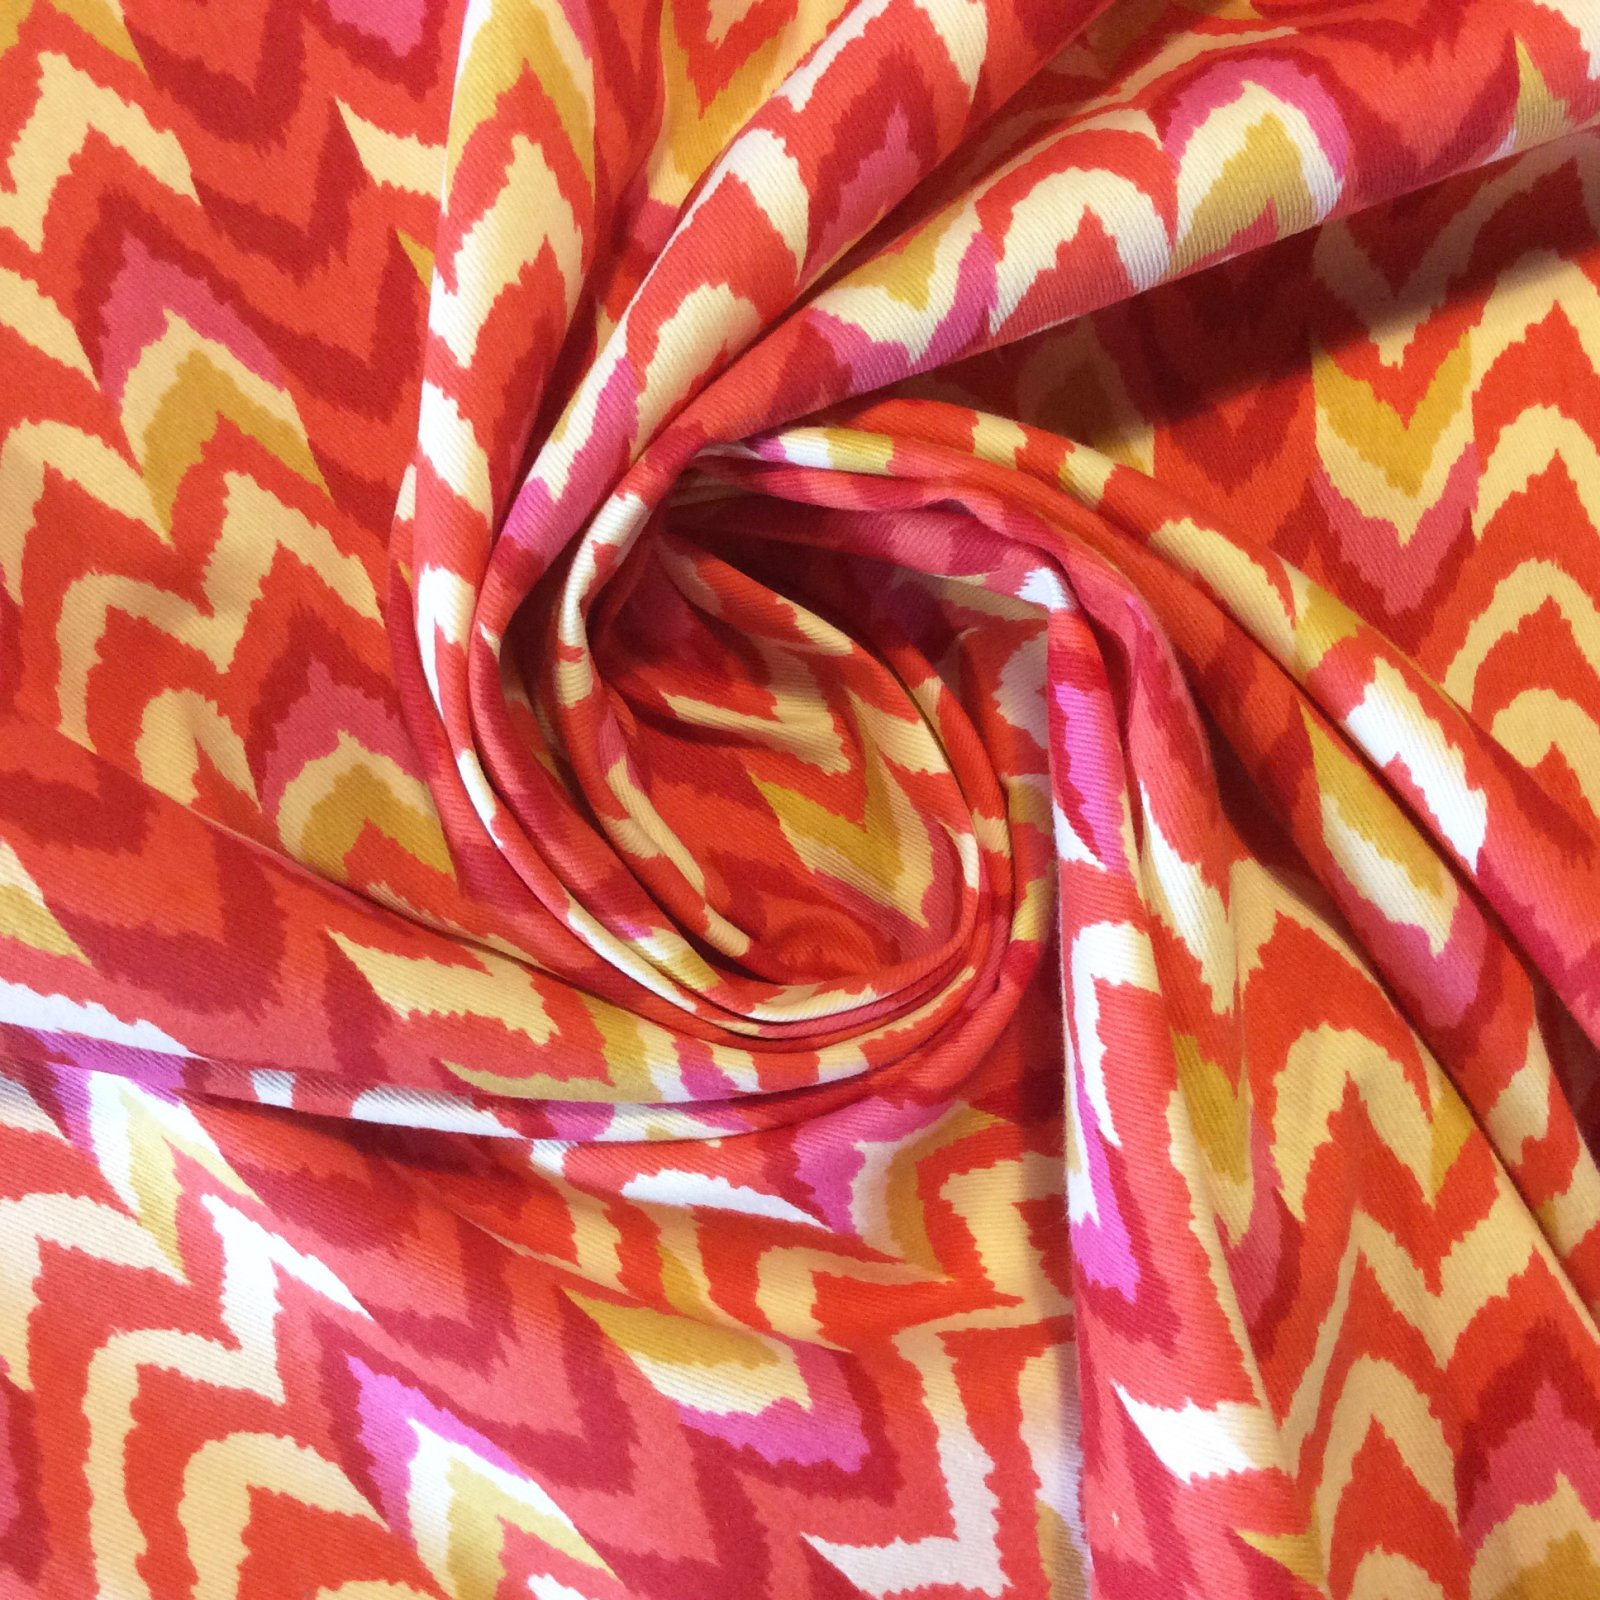 SOLD BY THE BOLT! 6 YARD BOLT! PCLC35 Chevron Neon Bright Pink Geo Geometric Wild Drapery Home Decor Fabric